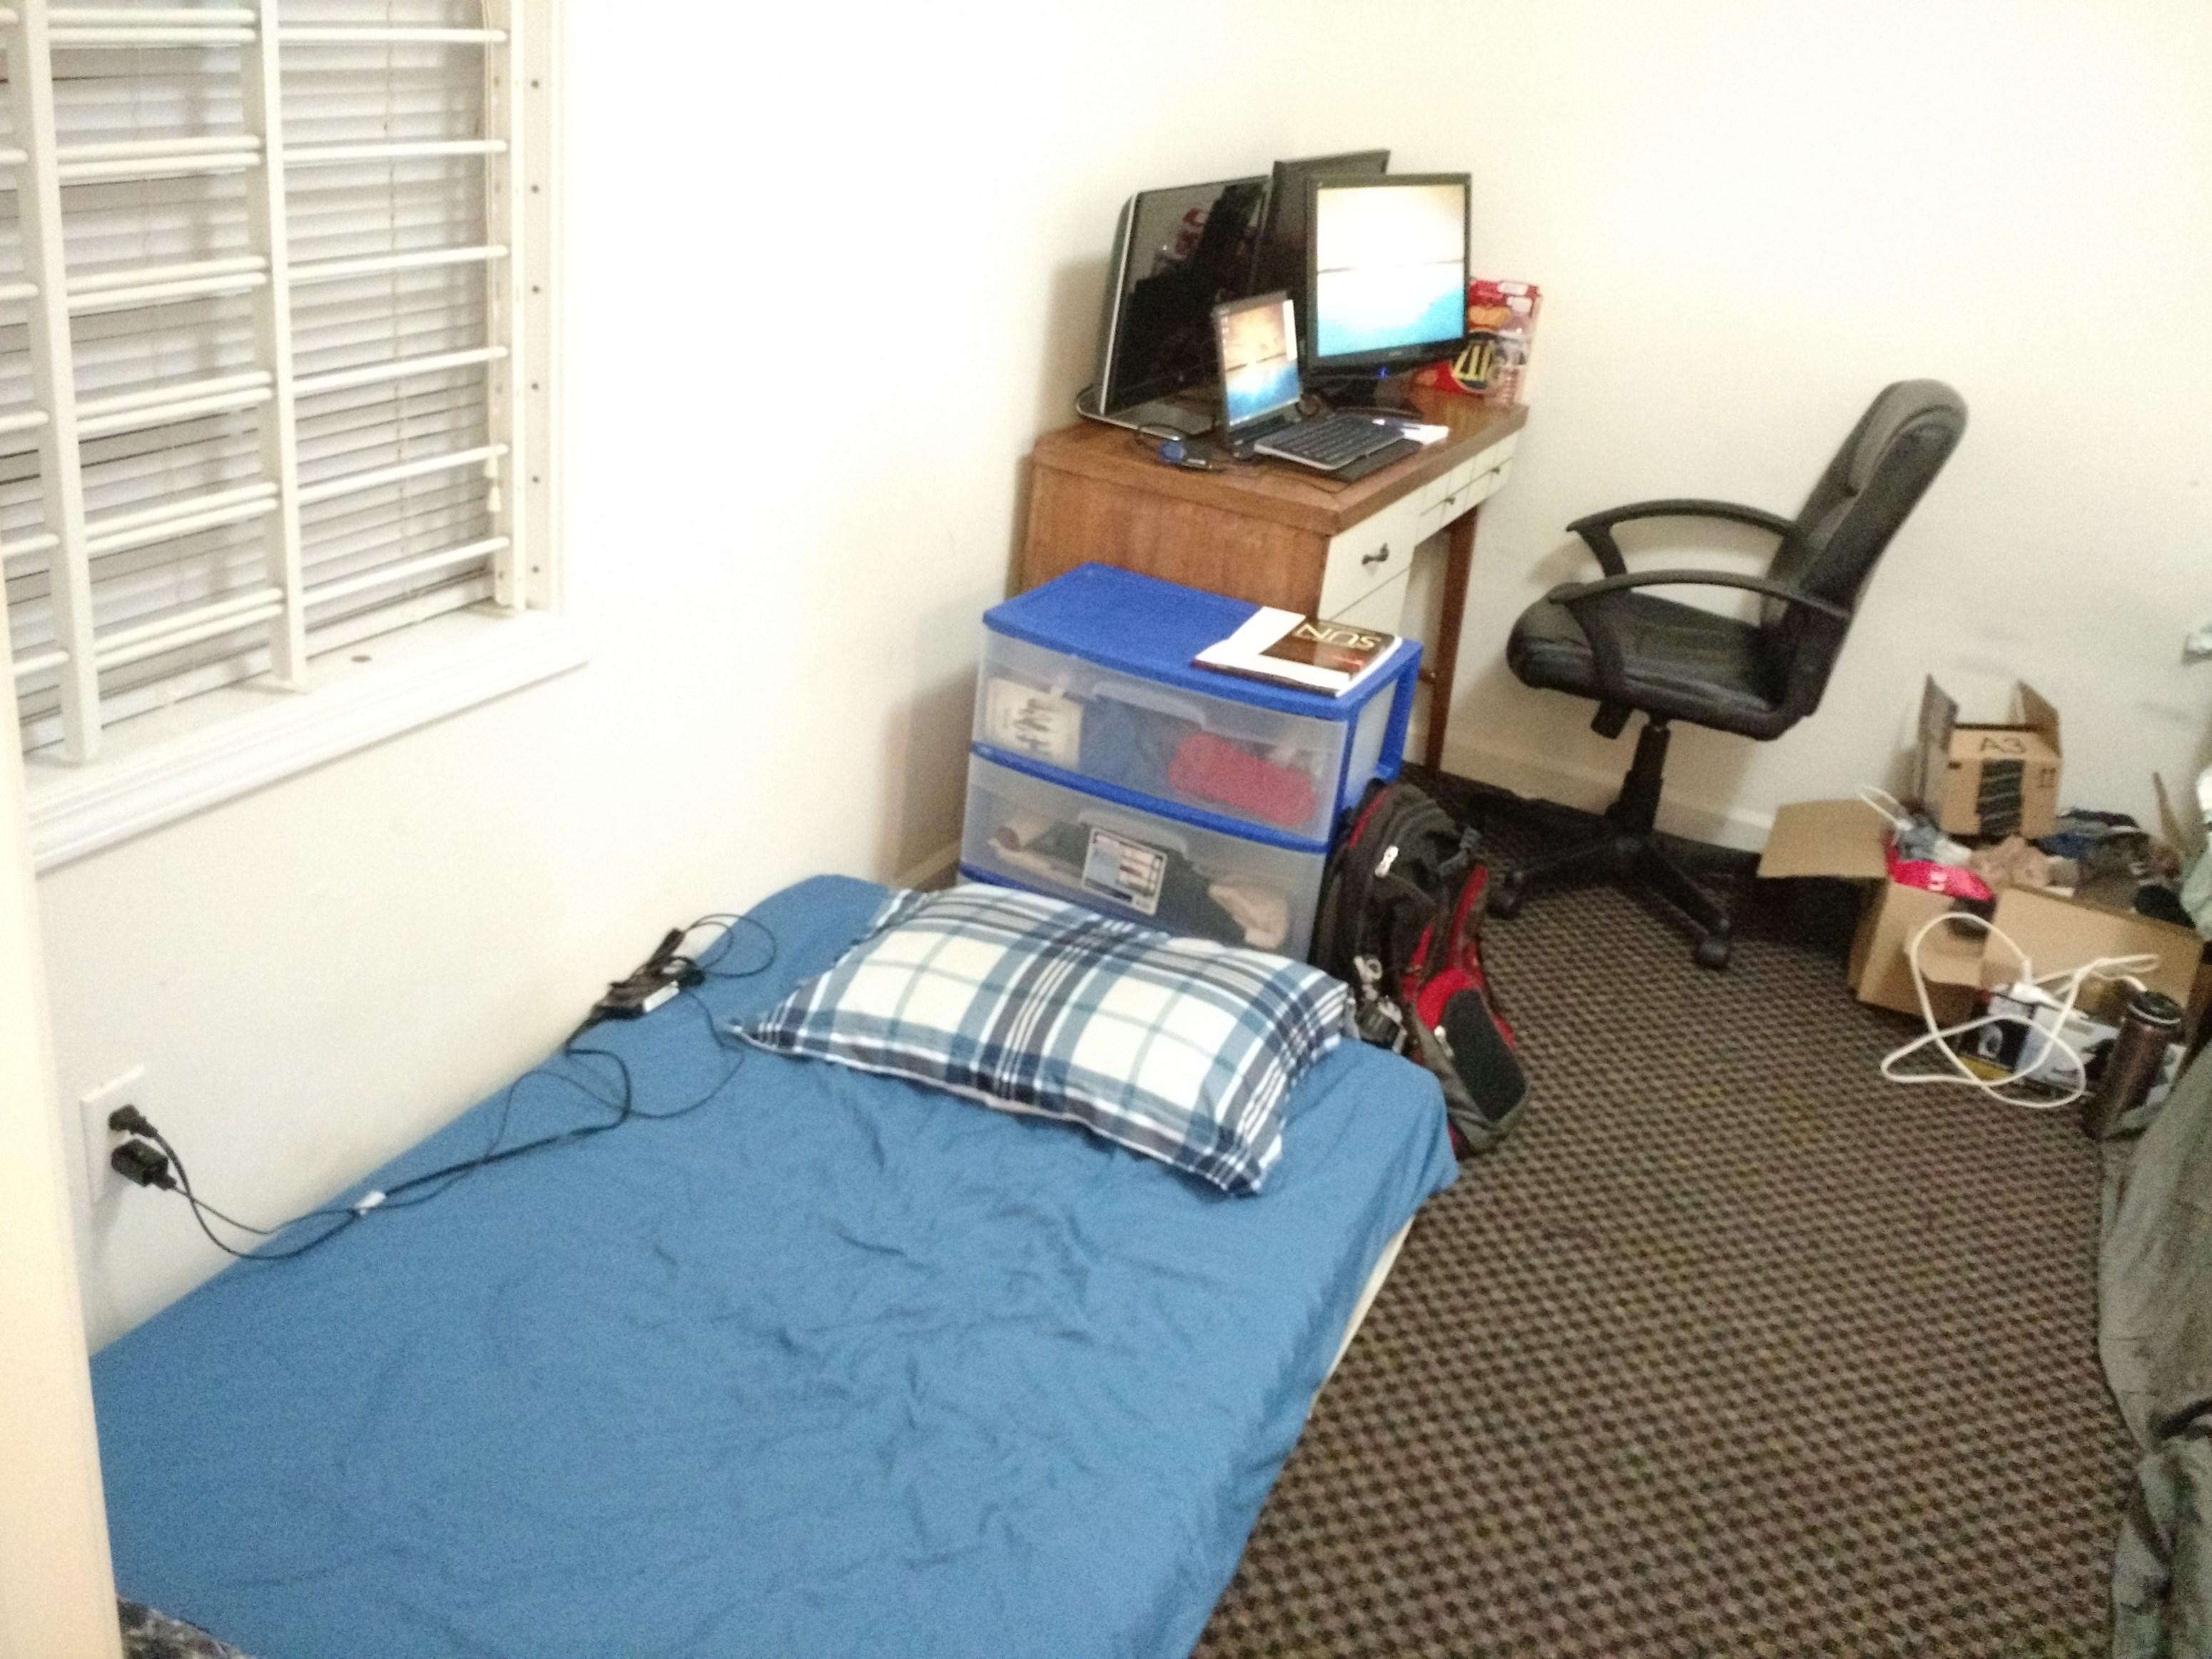 Shared Room For Rent Near Georgia Tech Midtown Atlanta In